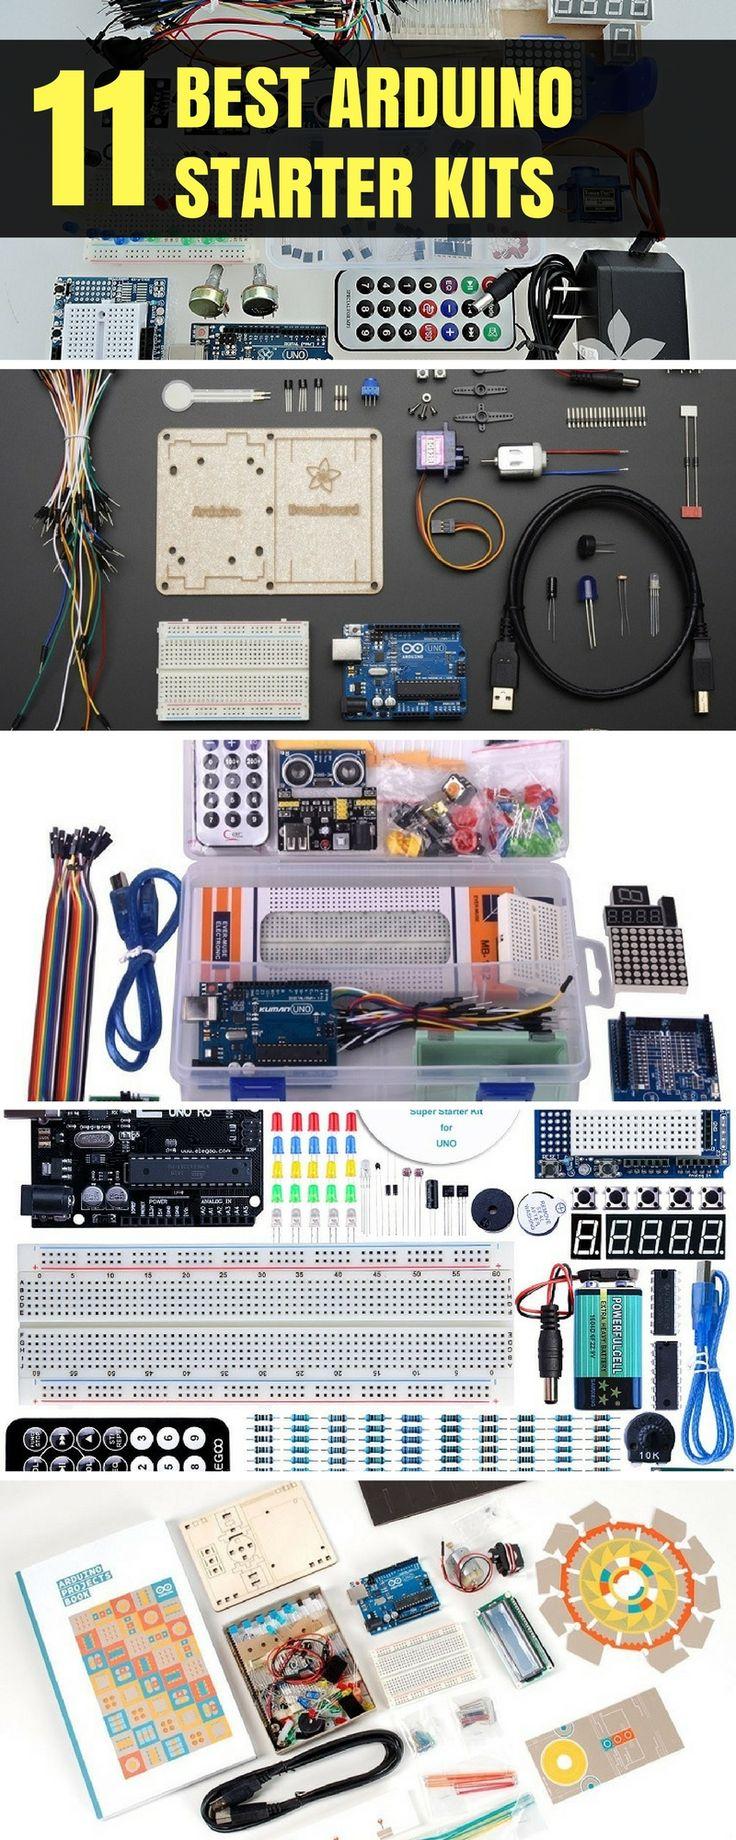 697 best raspberry images on pinterest raspberries technology and 10 best arduino starter kits for beginners diy electronicselectronics projectsarduino solutioingenieria Images